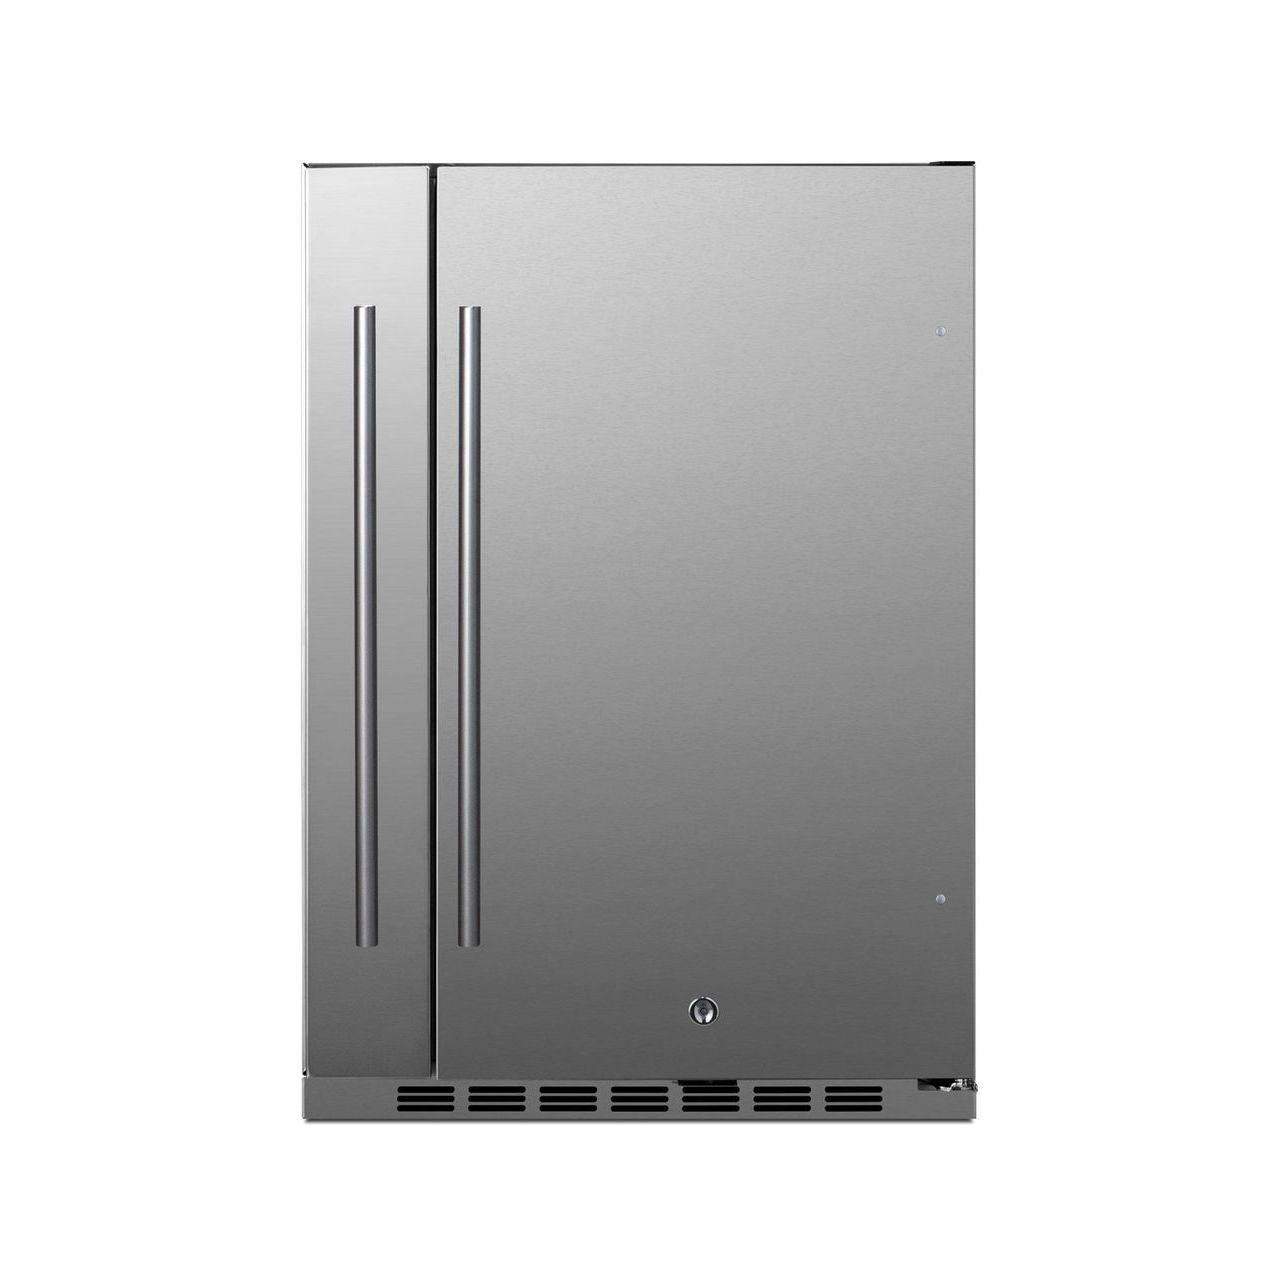 "Summit Shallow Depth 24"" Wide Built-In All-Refrigerator/Storage"